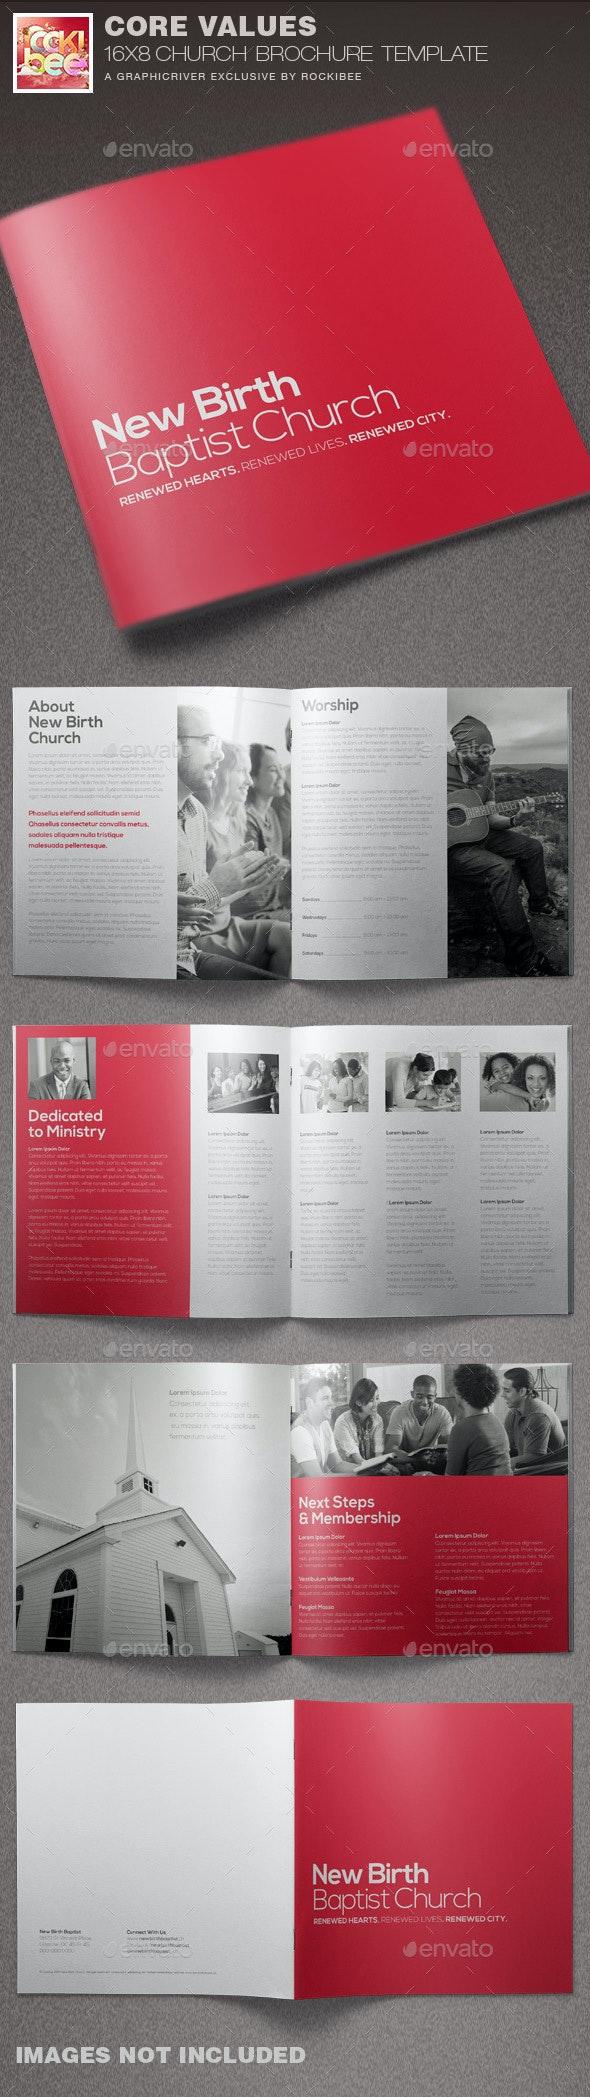 Core Values Church Brochure Template - Informational Brochures